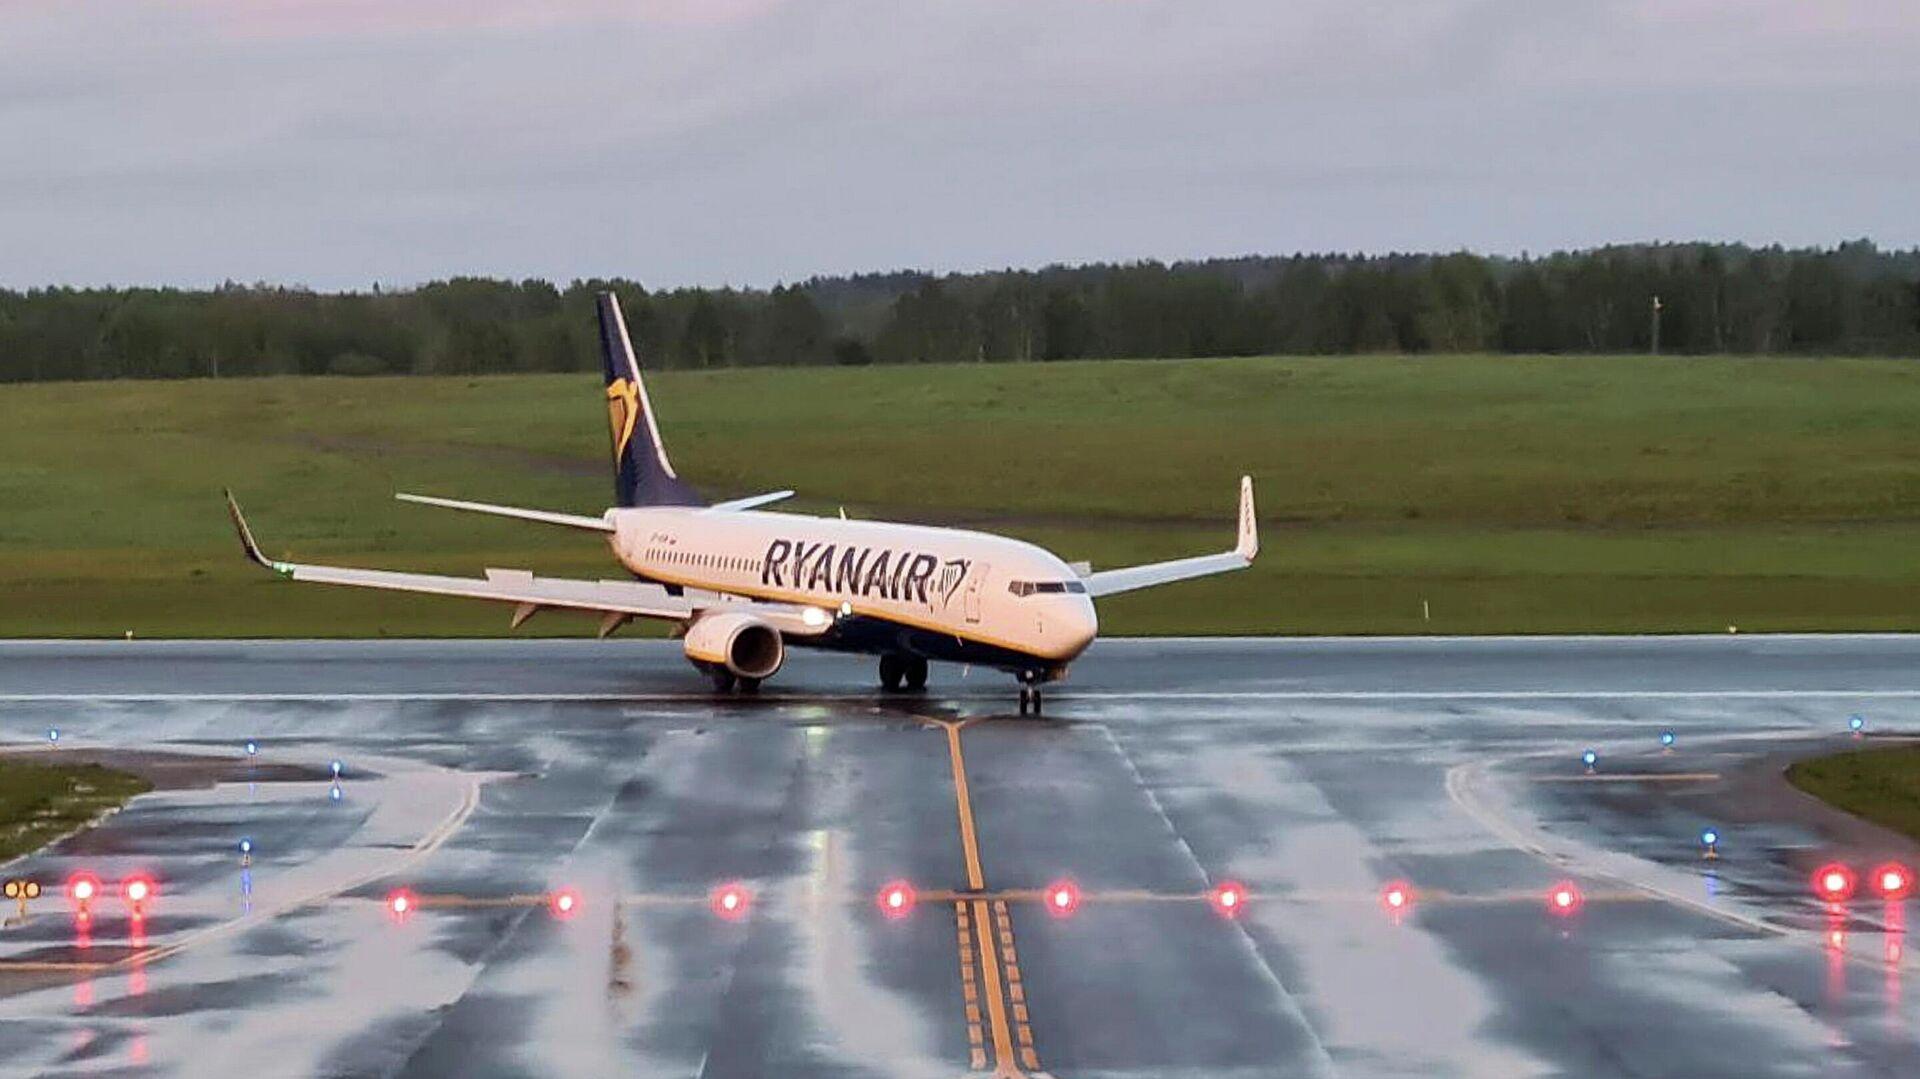 Самолет авиакомпании Ryanair, на котором находился Роман Протасевич, в аэропорту Вильнюса - РИА Новости, 1920, 28.05.2021